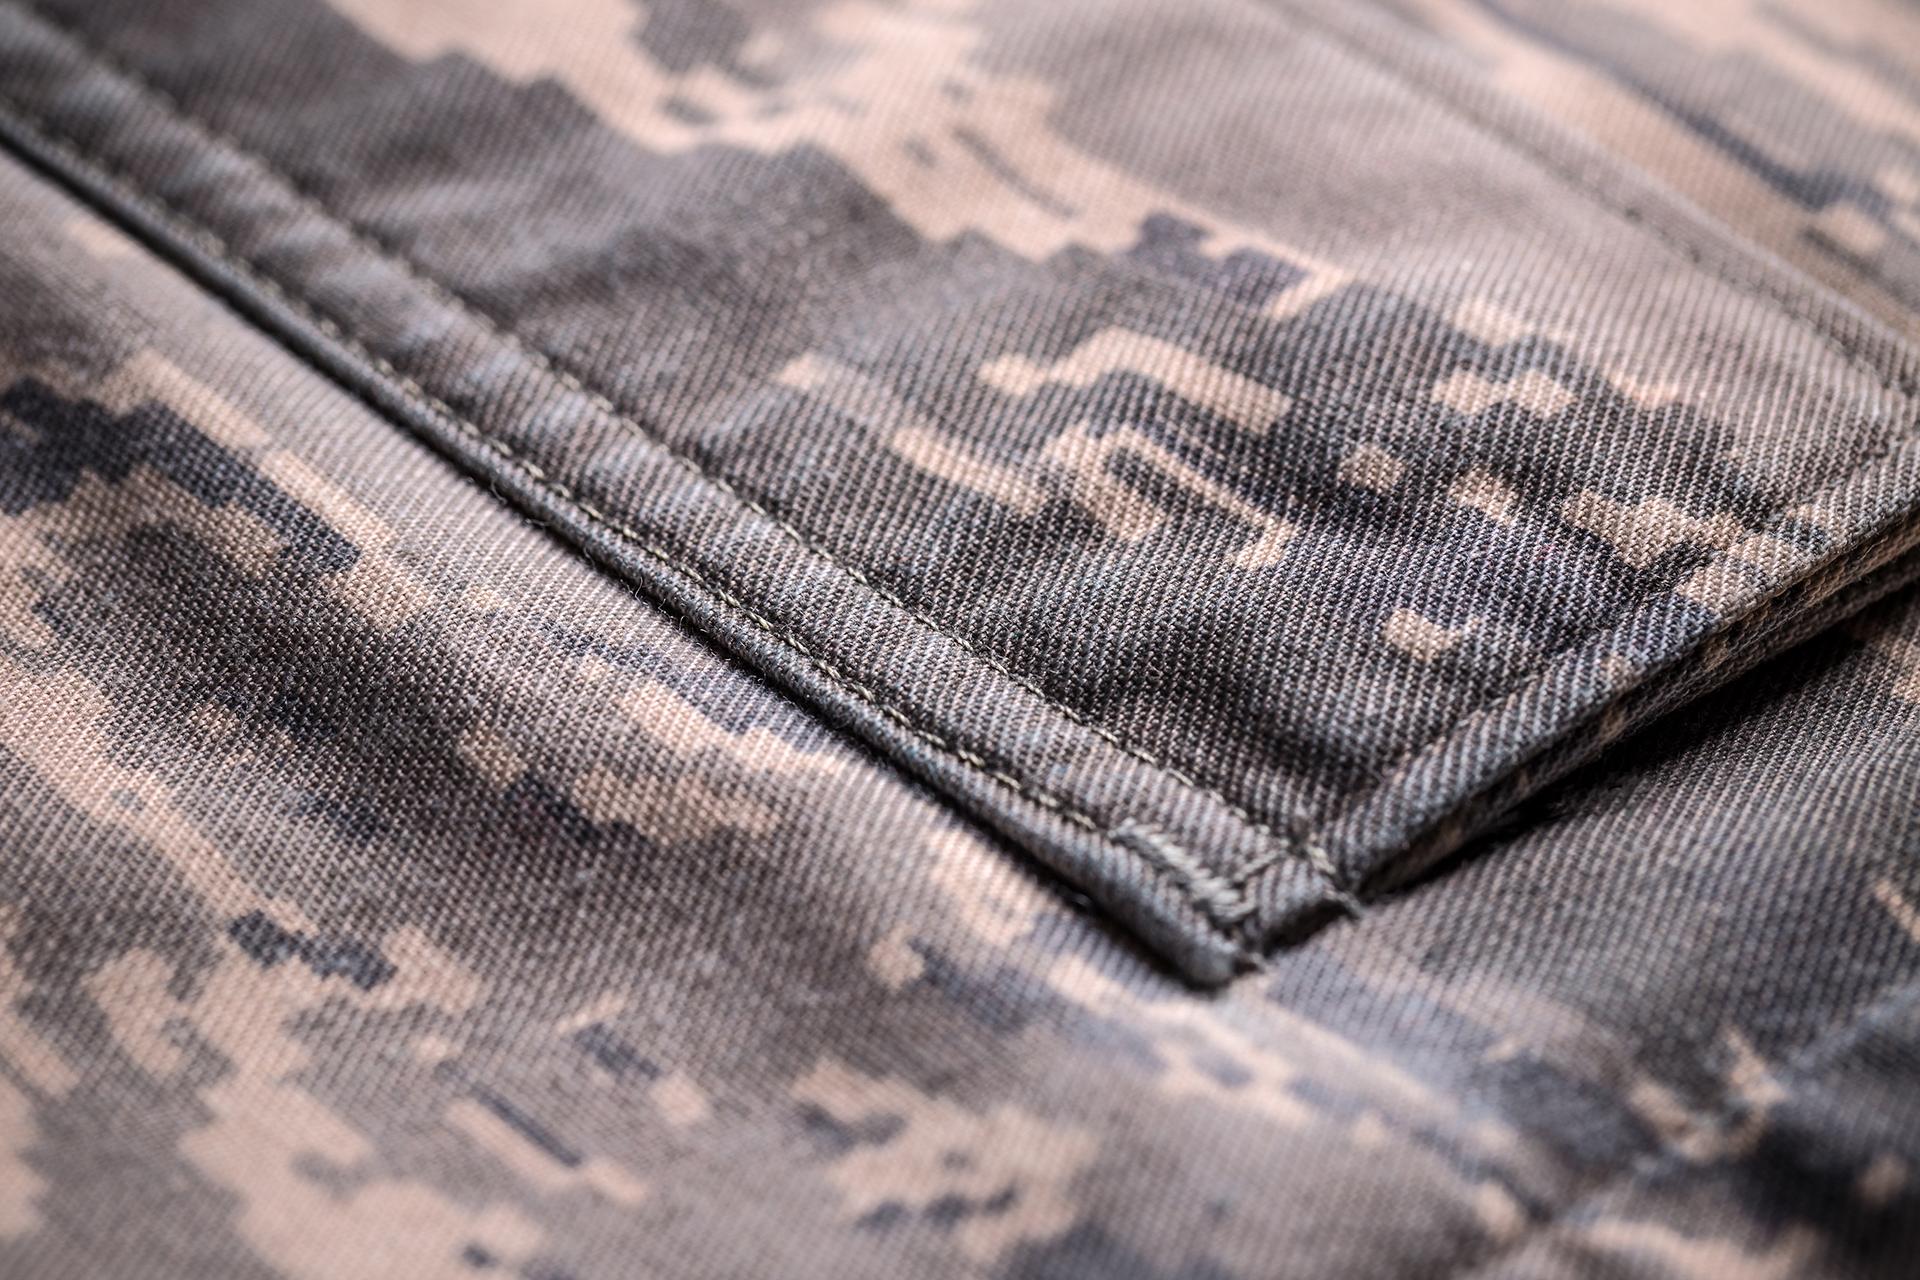 camouflage-shirt-pocket-PKL58TL.jpg